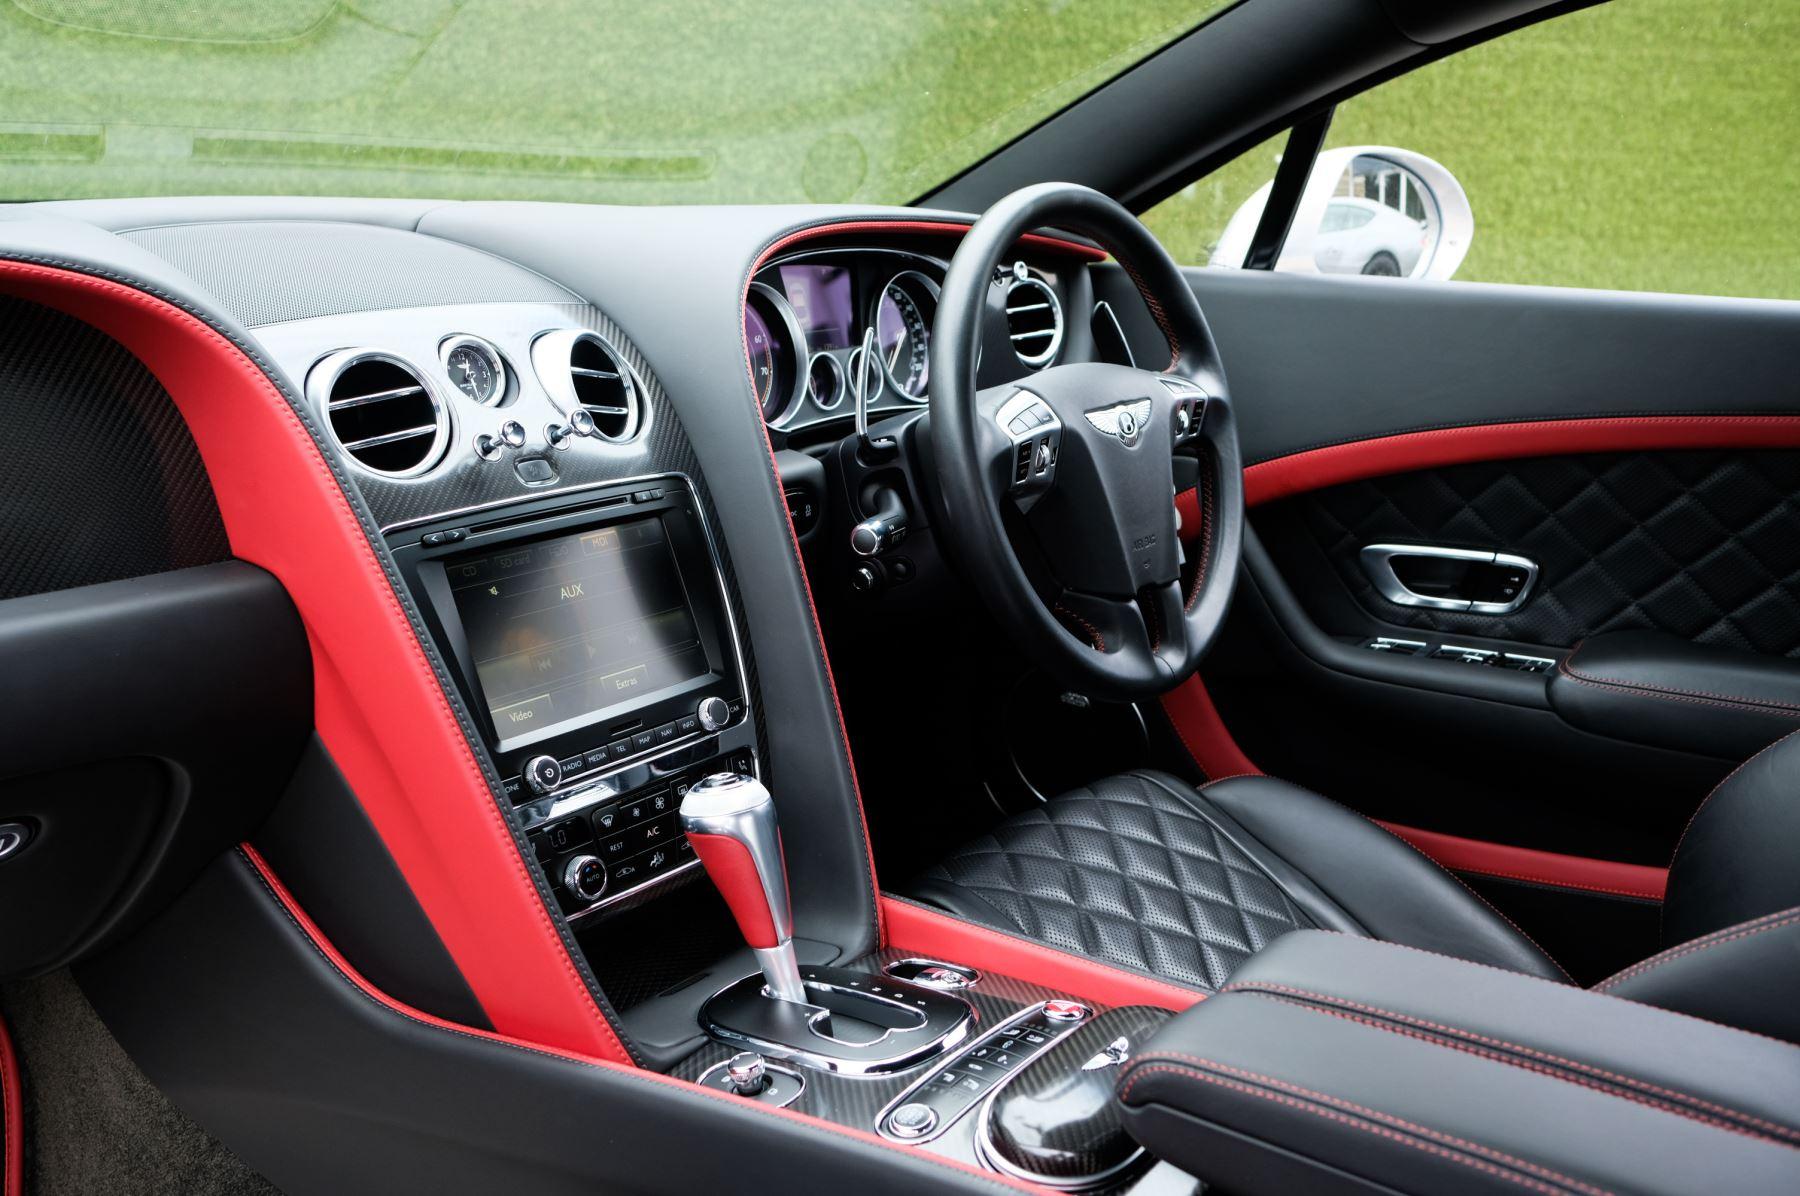 Bentley Continental GT 6.0 W12 [635] Speed - Premier Specification - Carbon Fibre Fascia Panels image 12